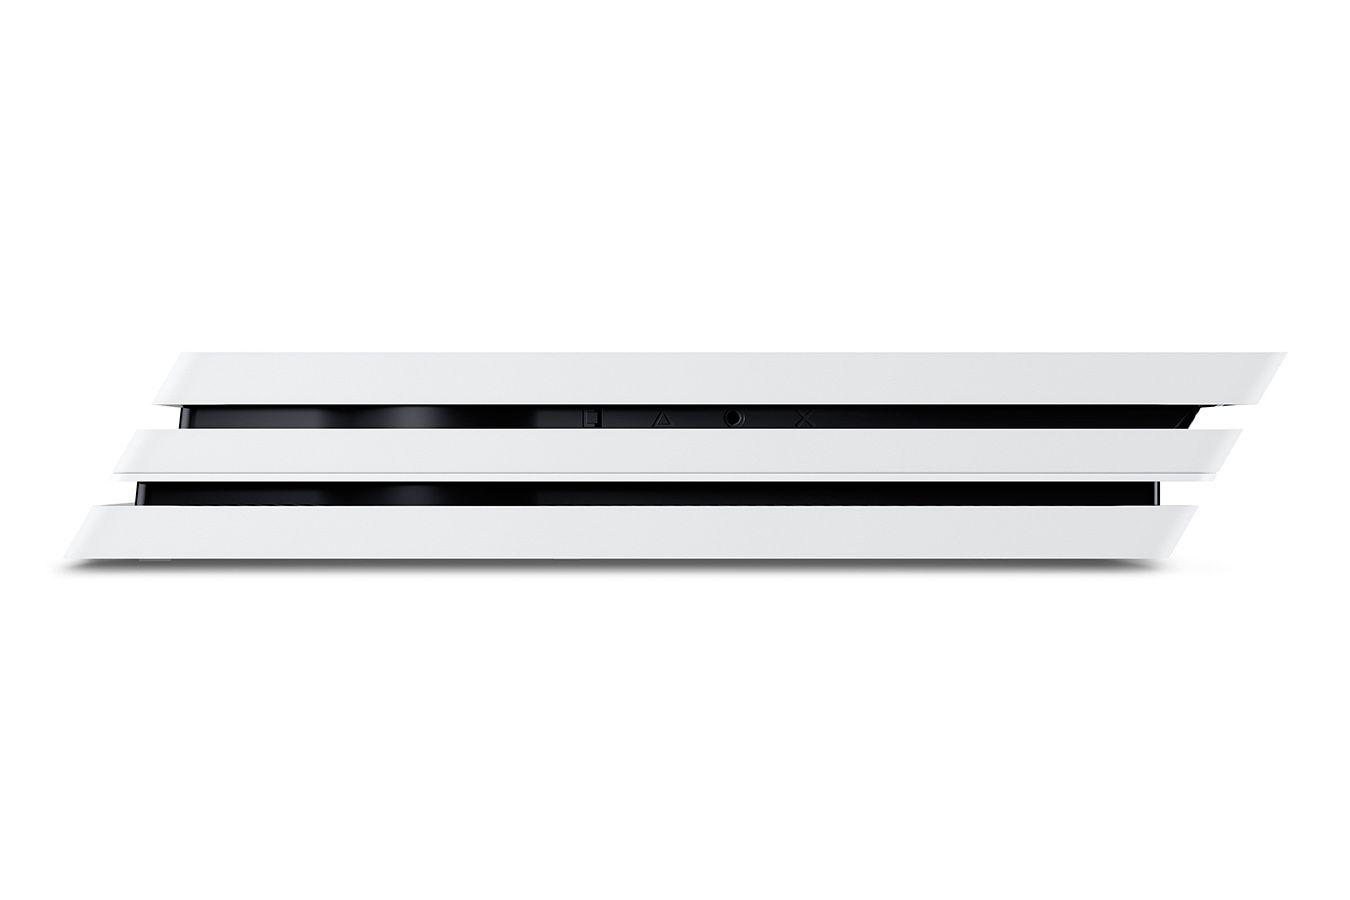 Белая PS4 Pro 2 джойстика изображение 0